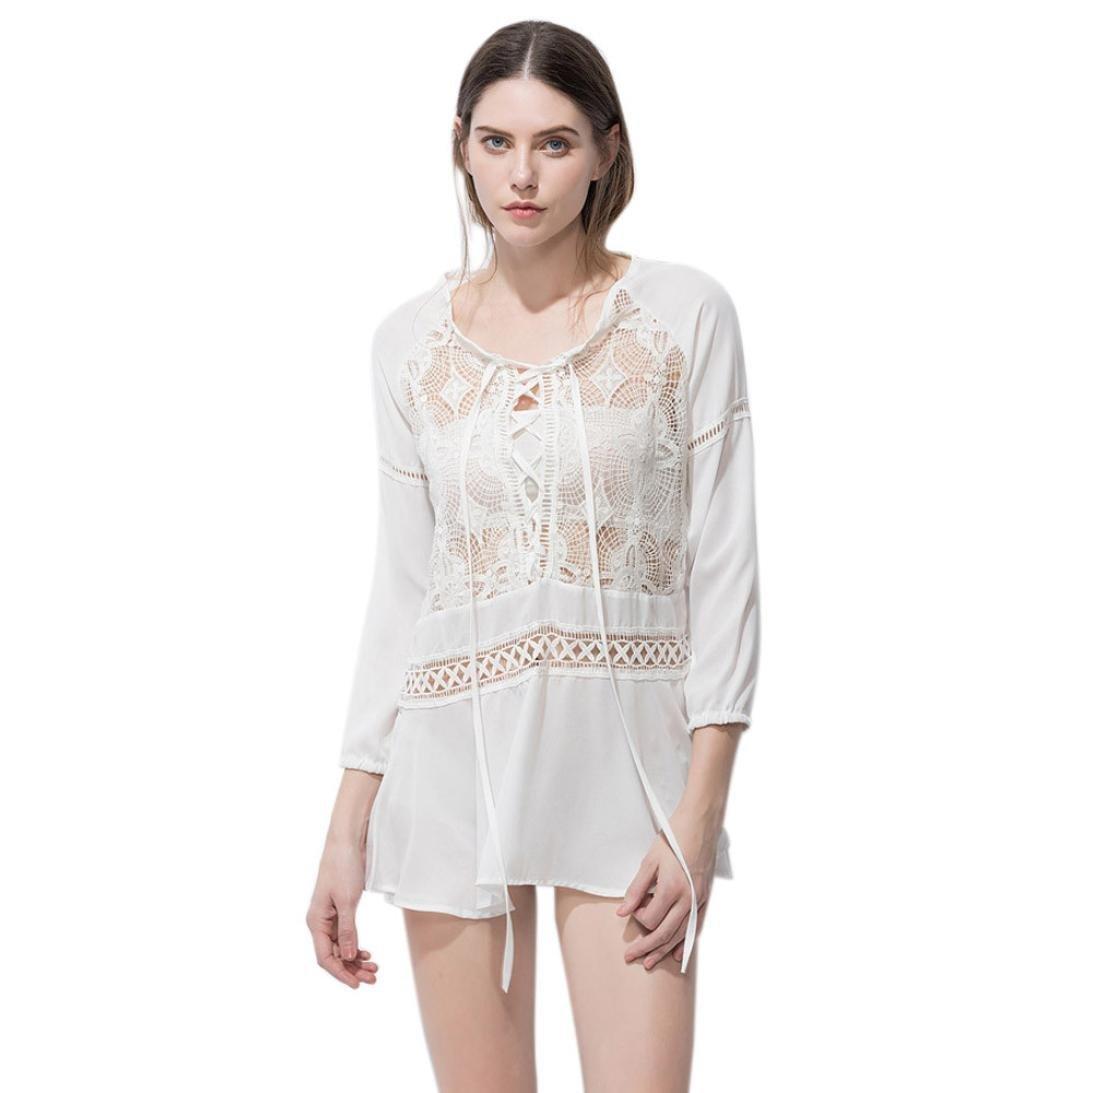 hunpta verano mujeres manga larga Hollow Out Casual encaje blusa playa Top T Shirt, blanco, extra-la...